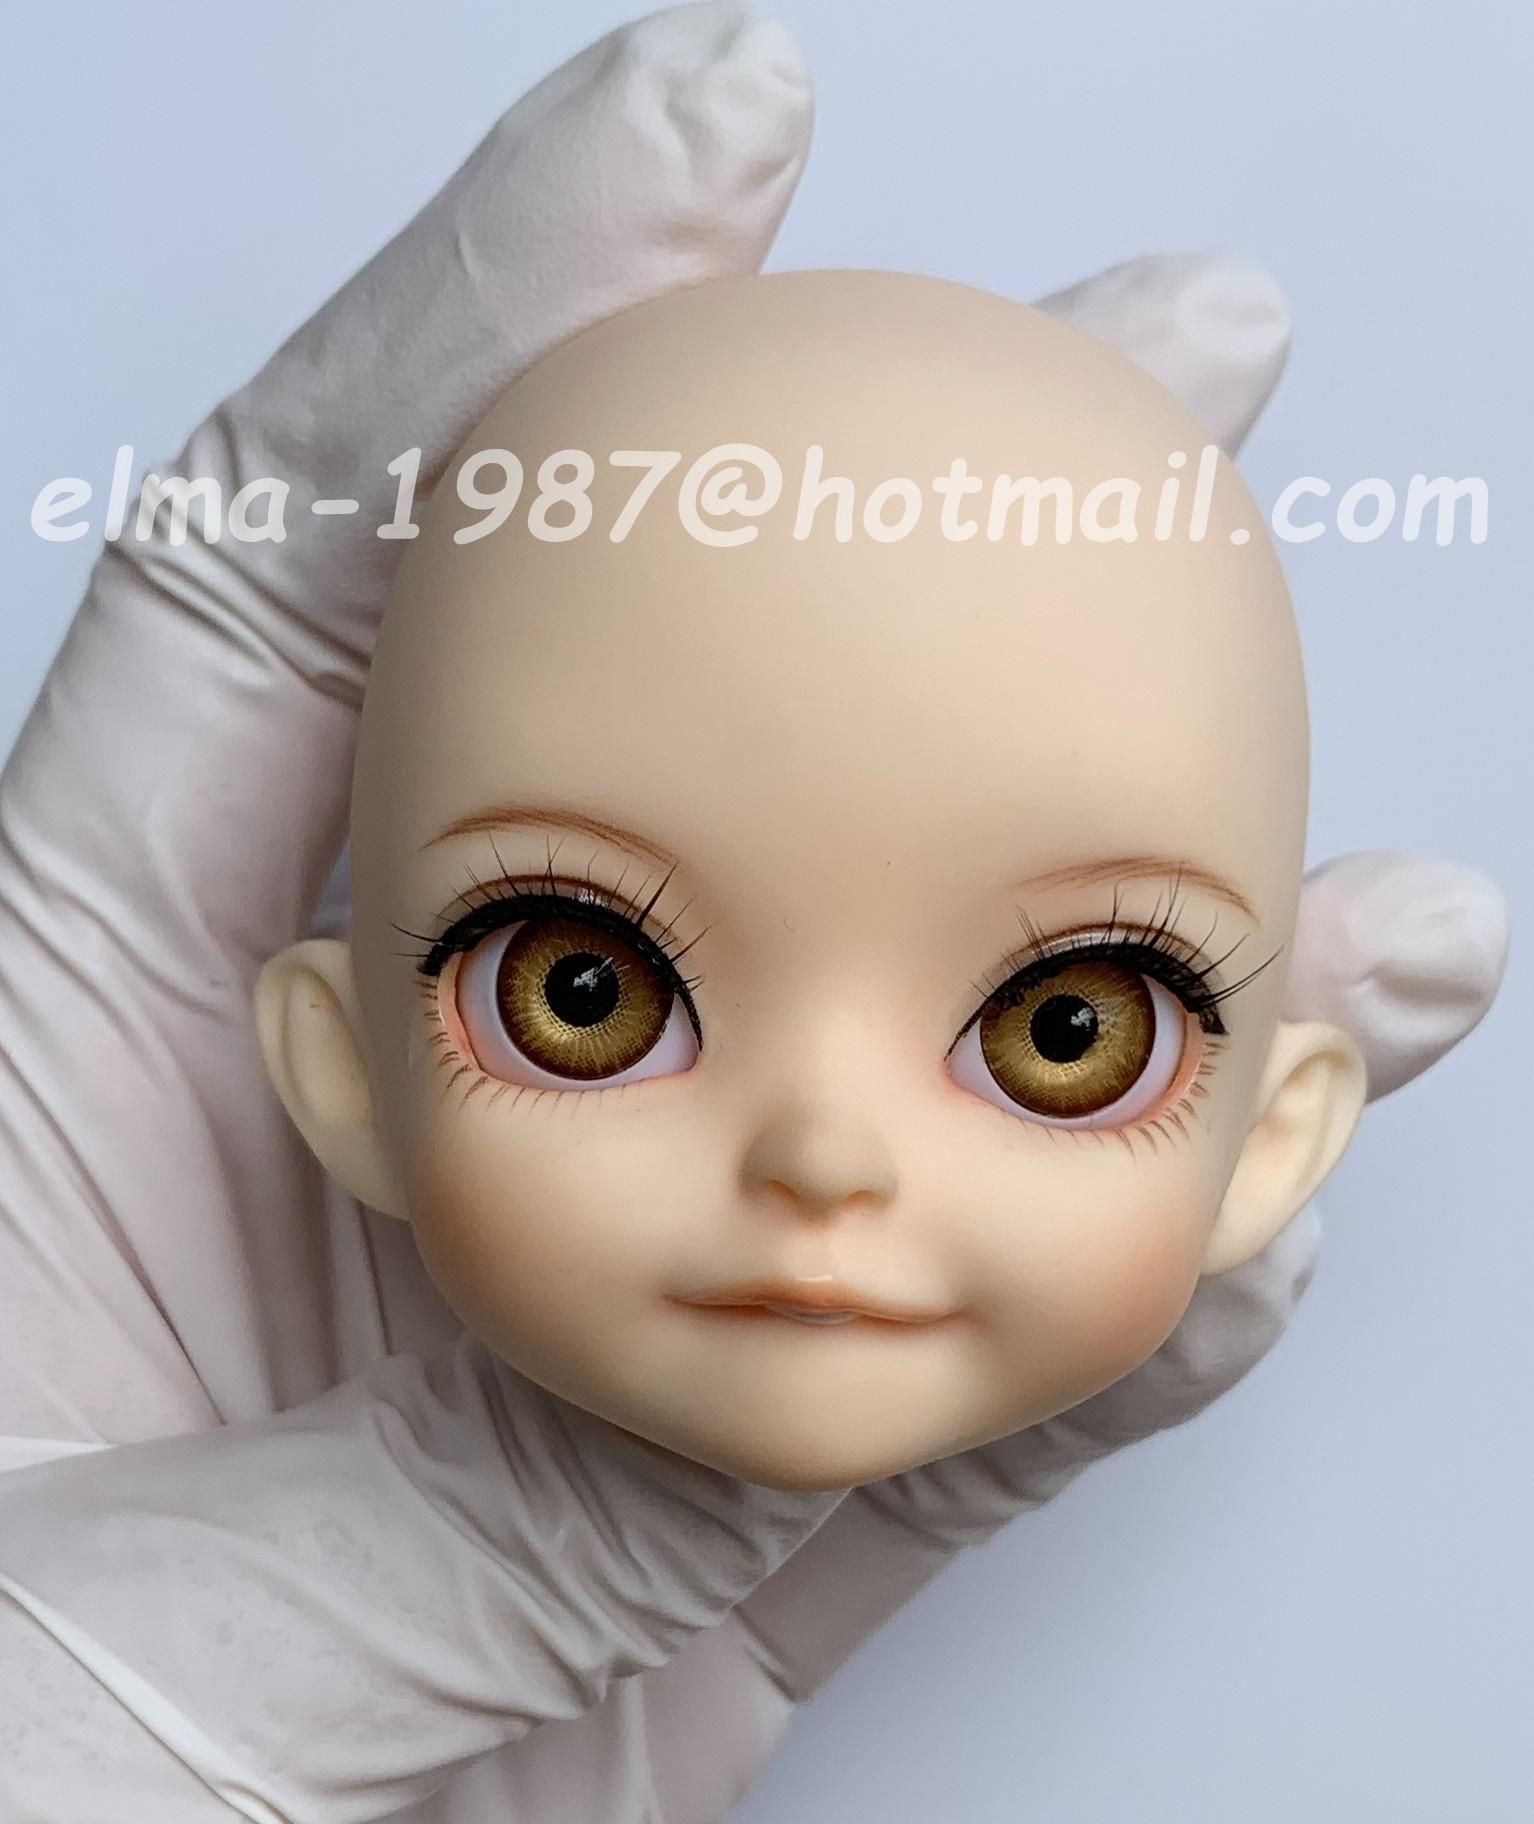 doll-peter-bjd-1.jpg